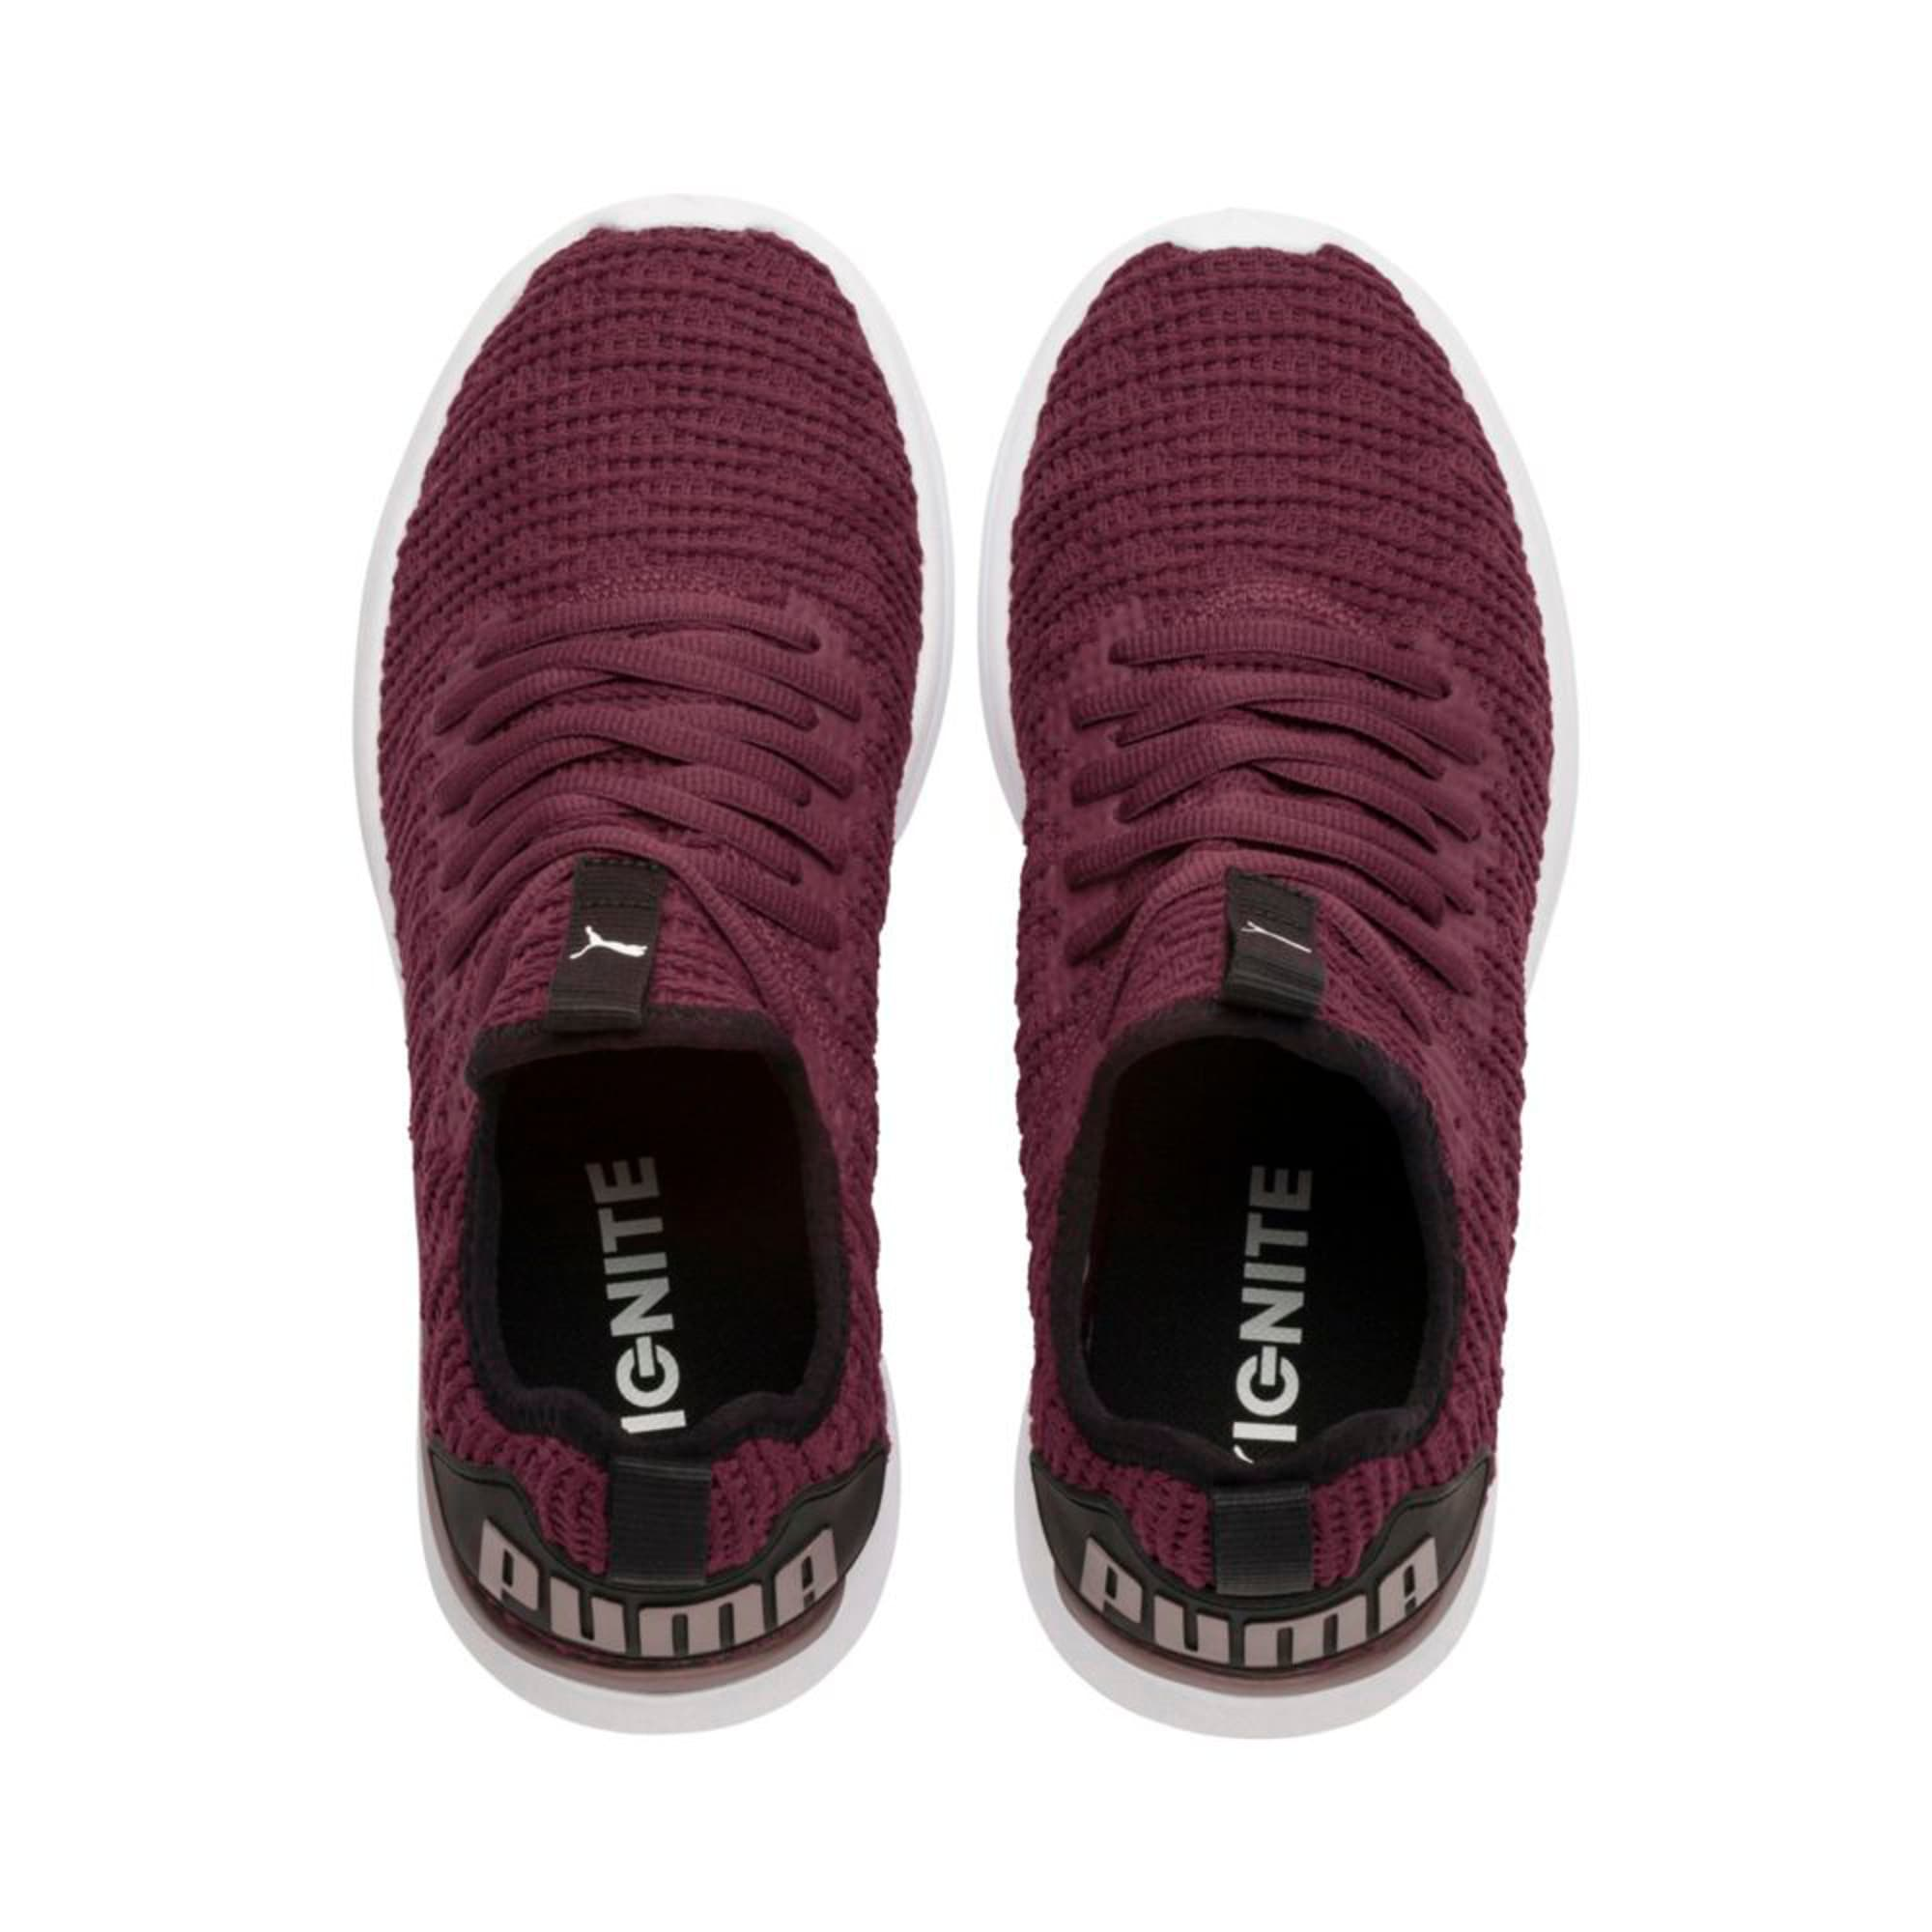 Thumbnail 3 of IGNITE Flash Luxe Women's Running Shoes, Fig-Black-Metallic Ash, medium-IND